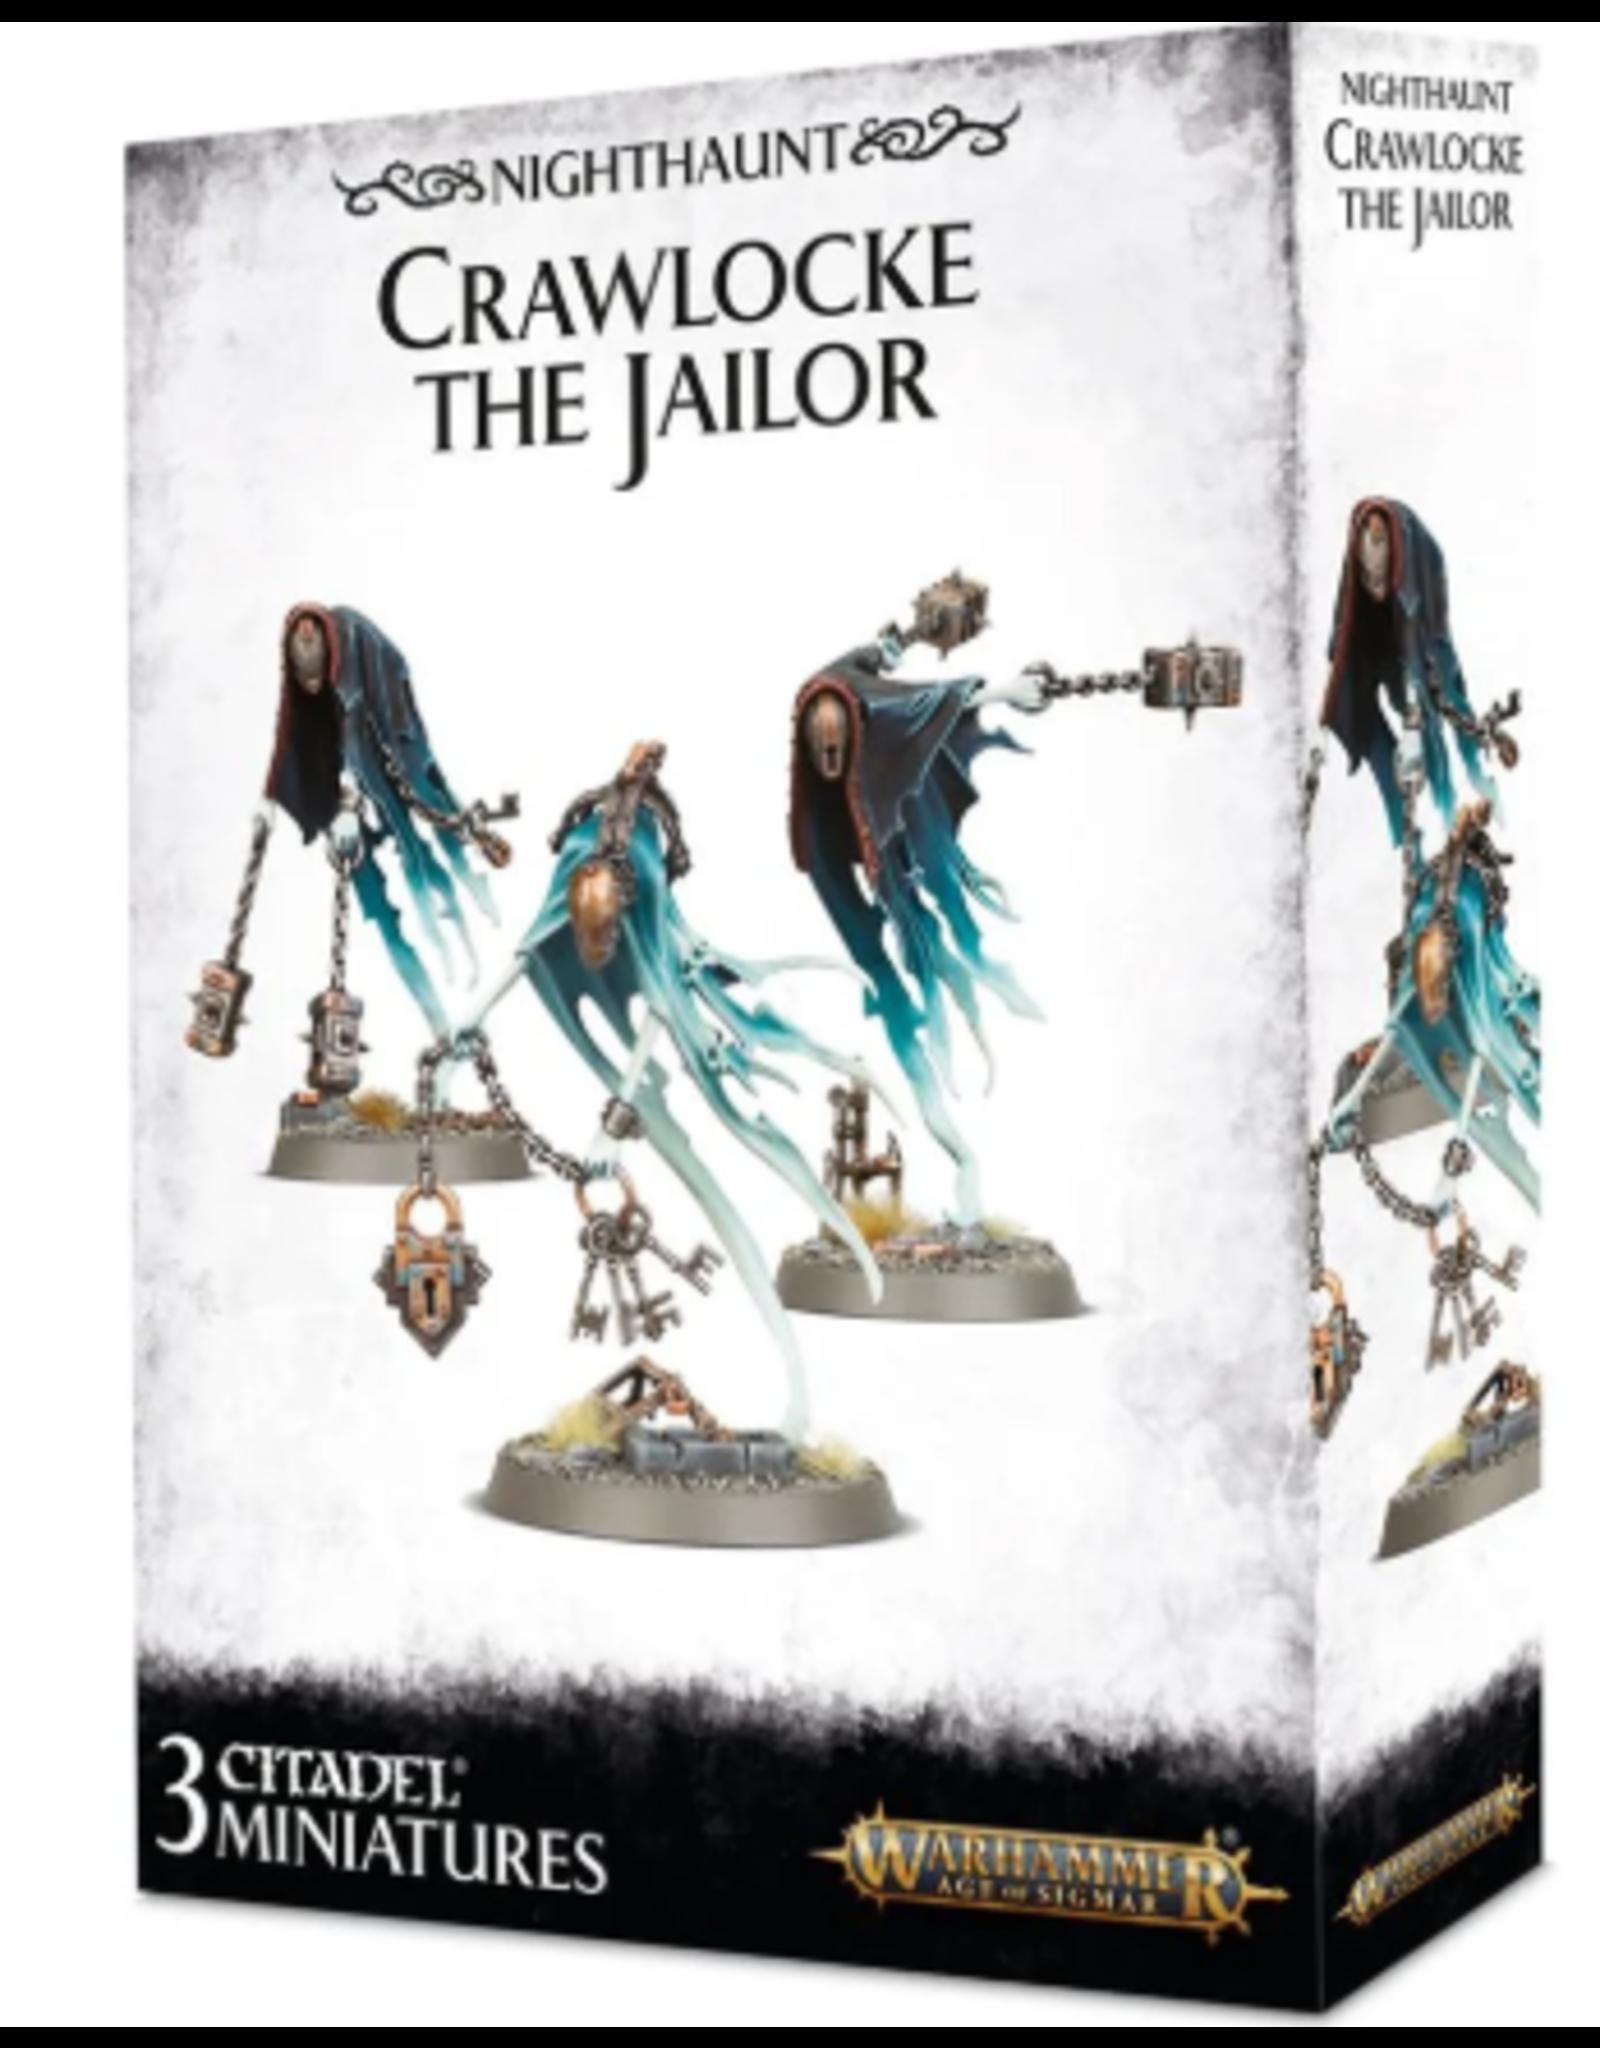 Games Workshop CRAWLOCKE THE JAILOR AND CHAINGHASTS